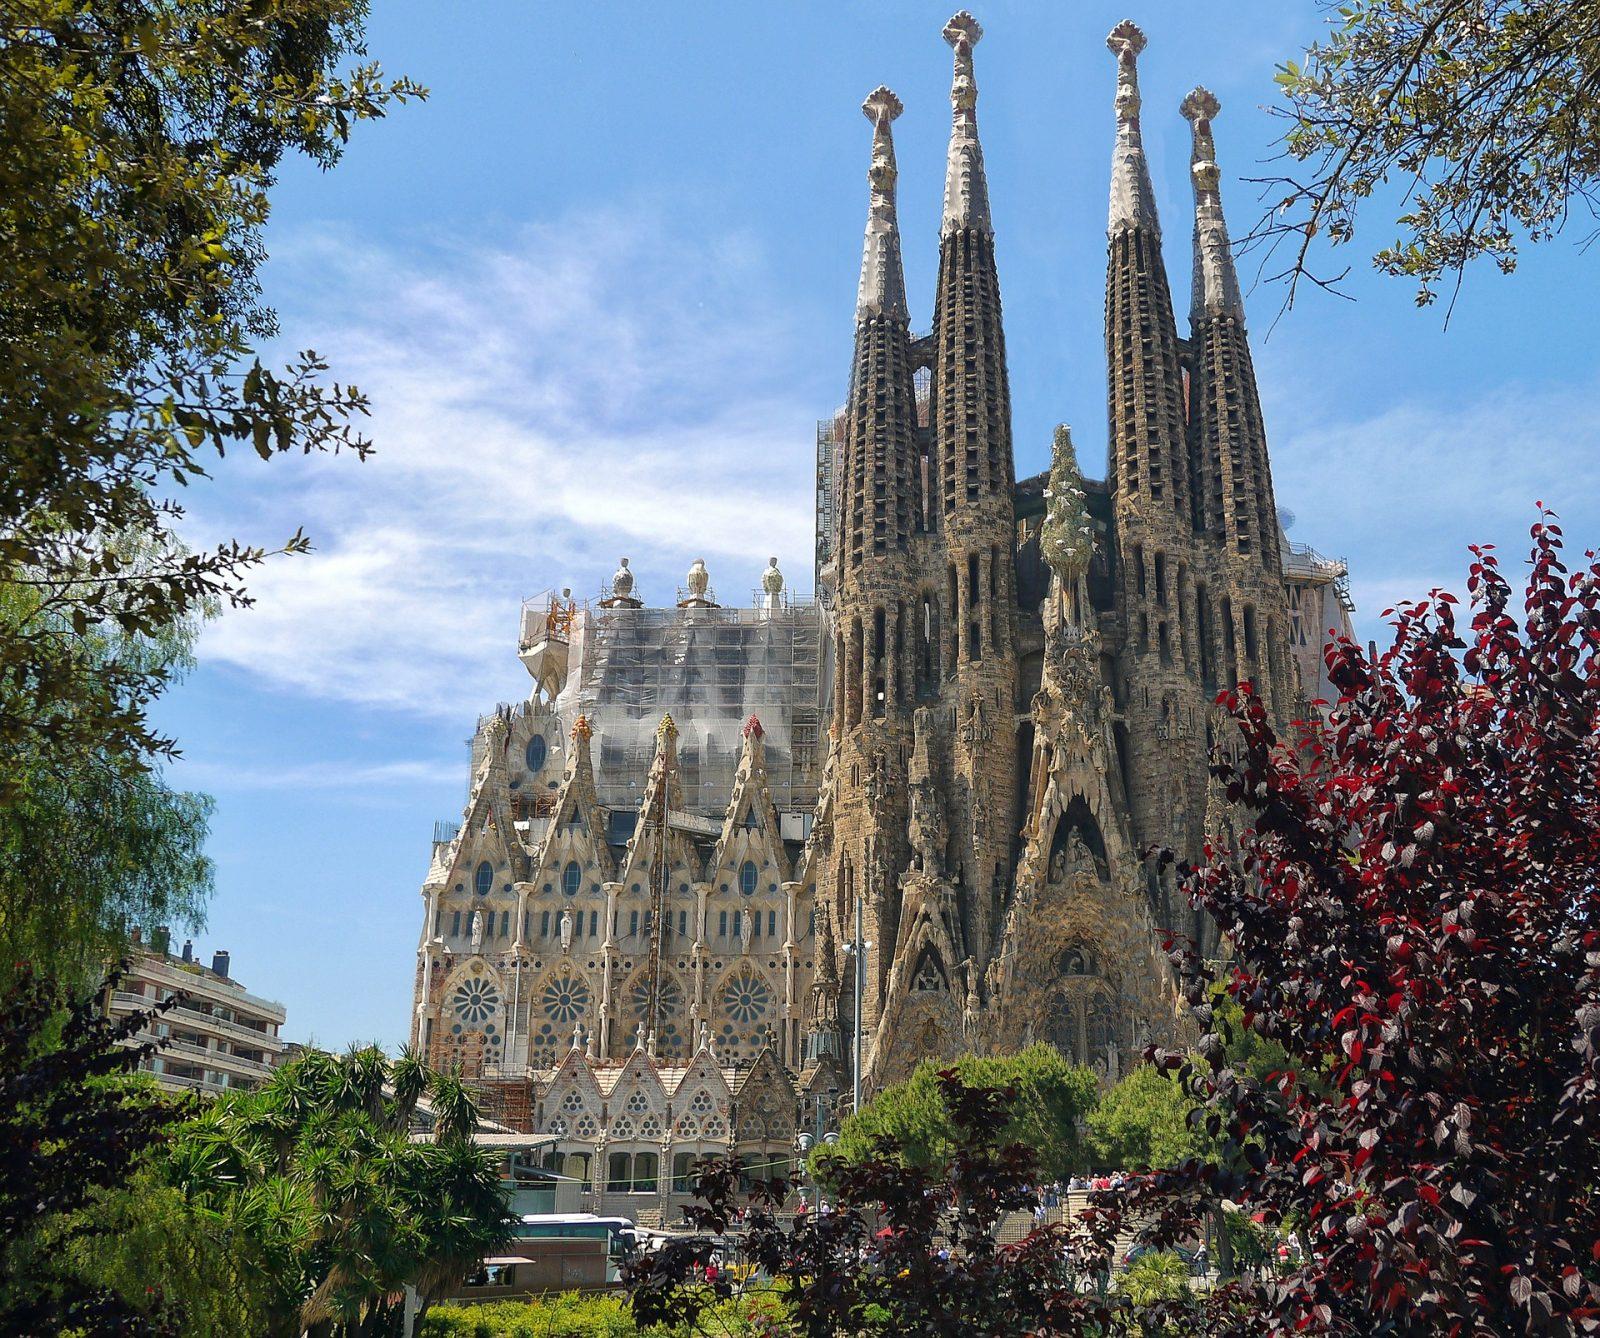 Evropski gradovi, Evropska putovanja, Evropske metropole, Barselona